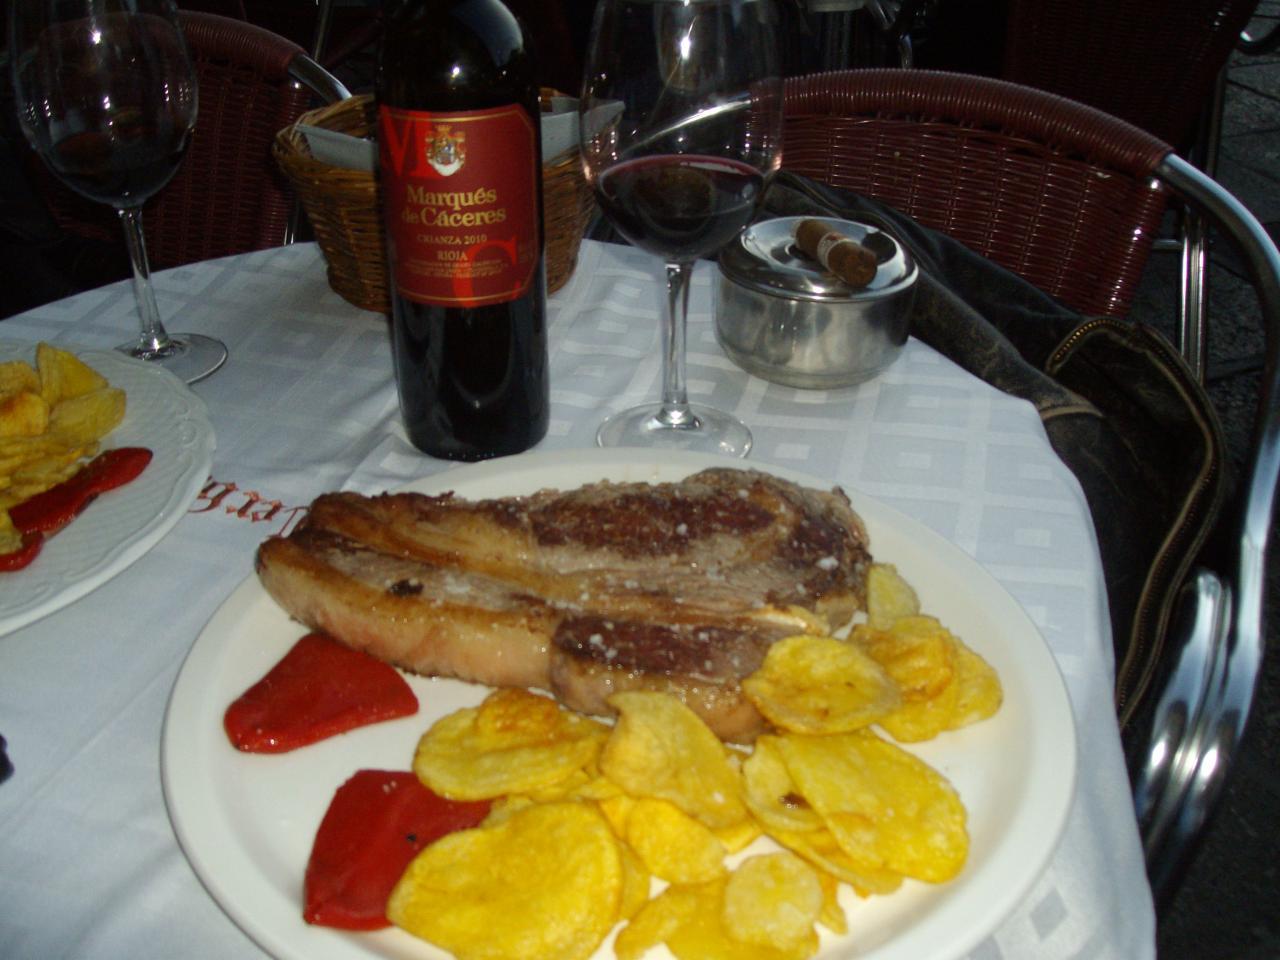 Cote de boeuf a SALAMANCA et vino MARQUEZ DE CASERES